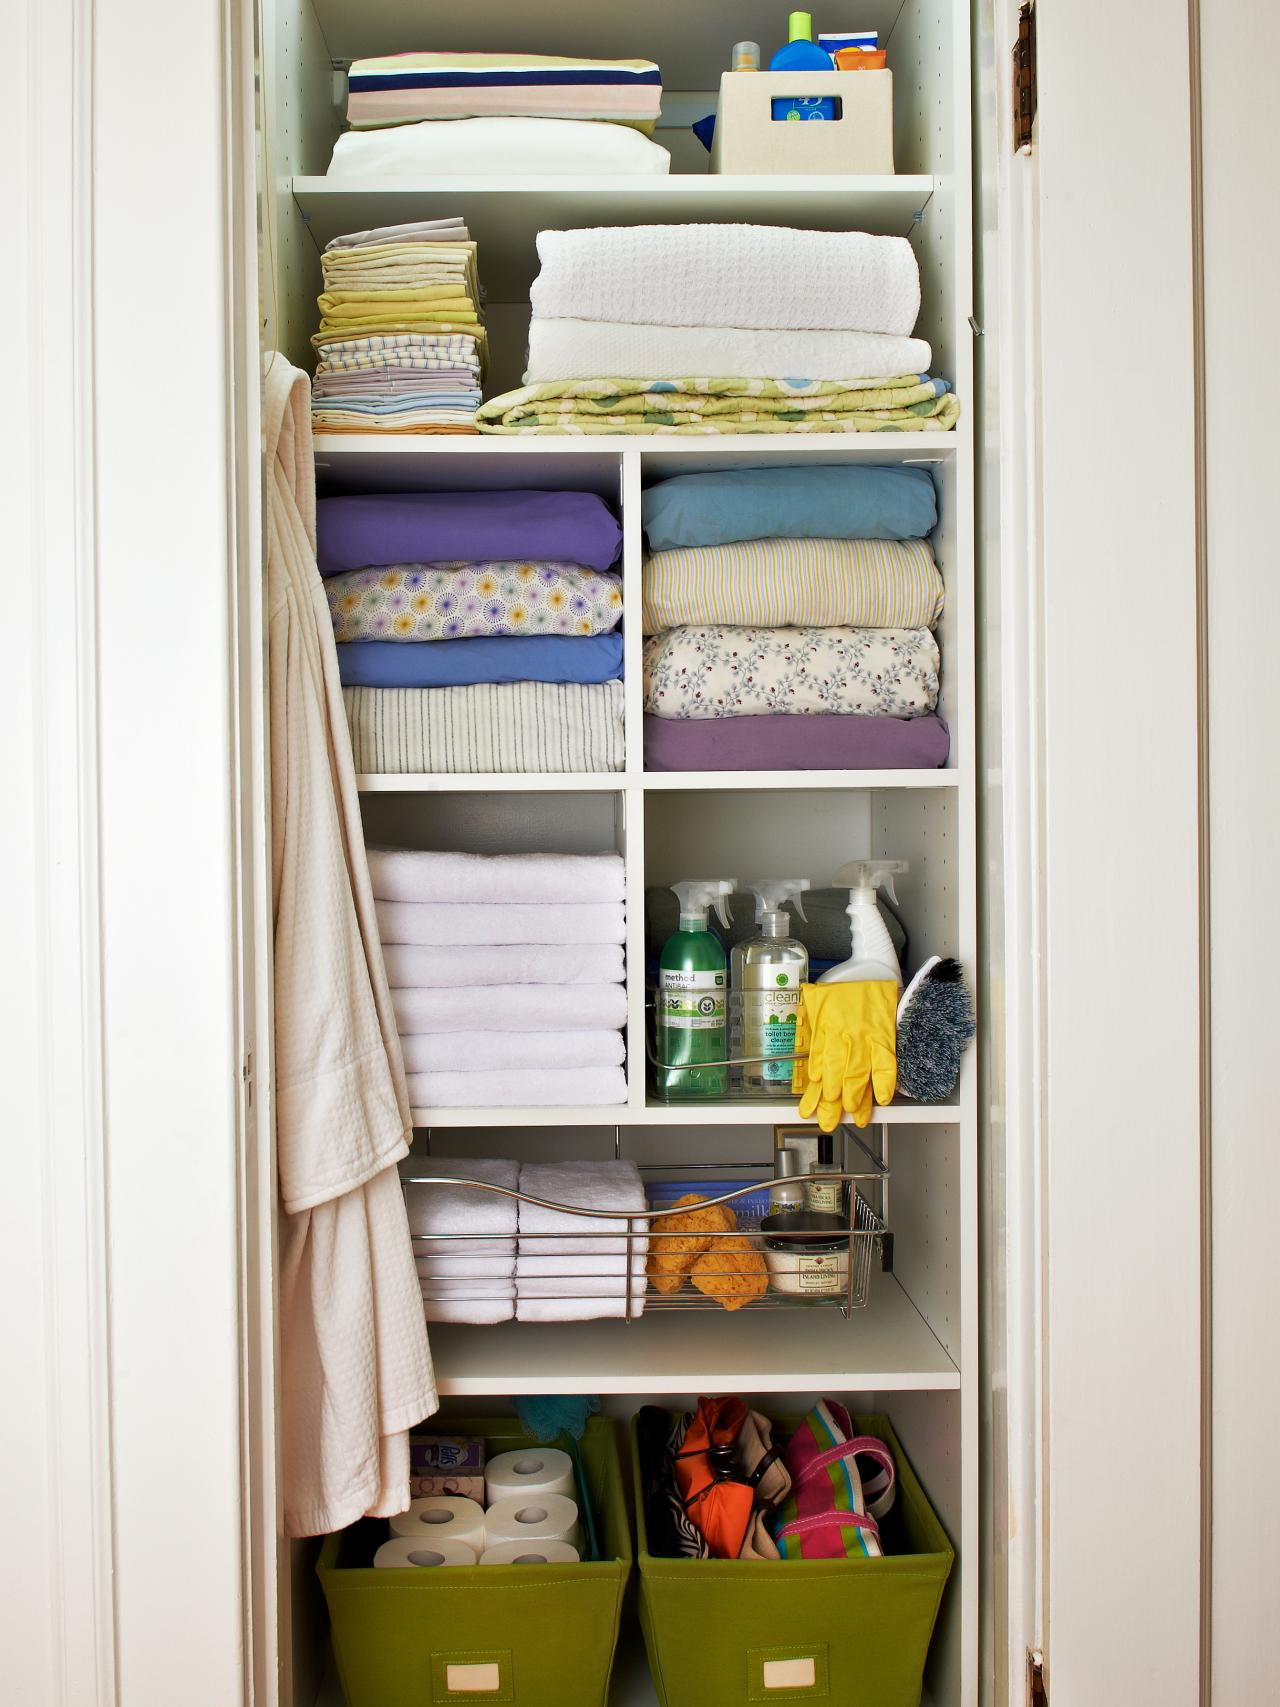 walk-in-linen-closet-design-photo-9